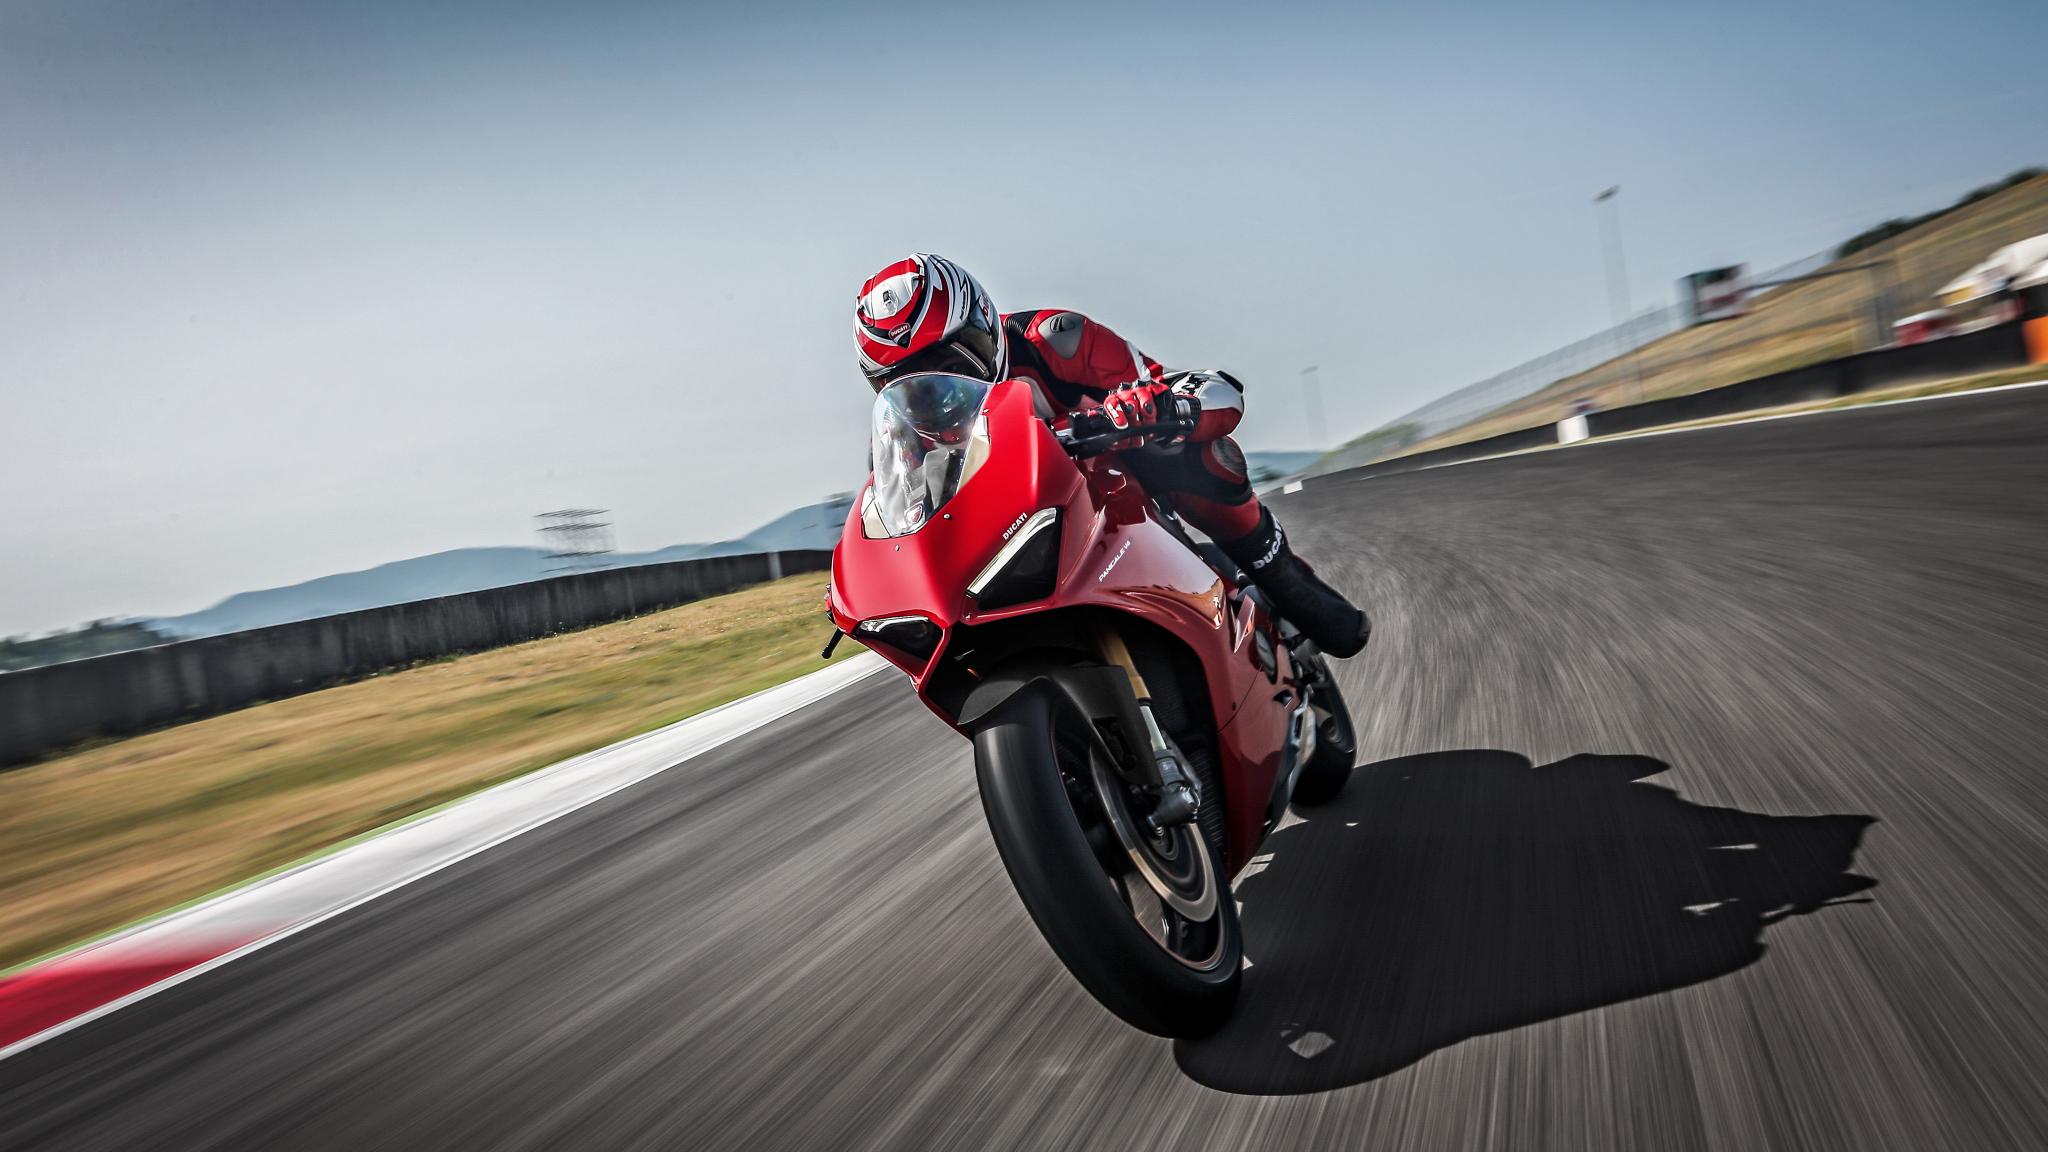 Ducati panigale v4, speciale, 2018, racing bike, 2048x1152 wallpaper